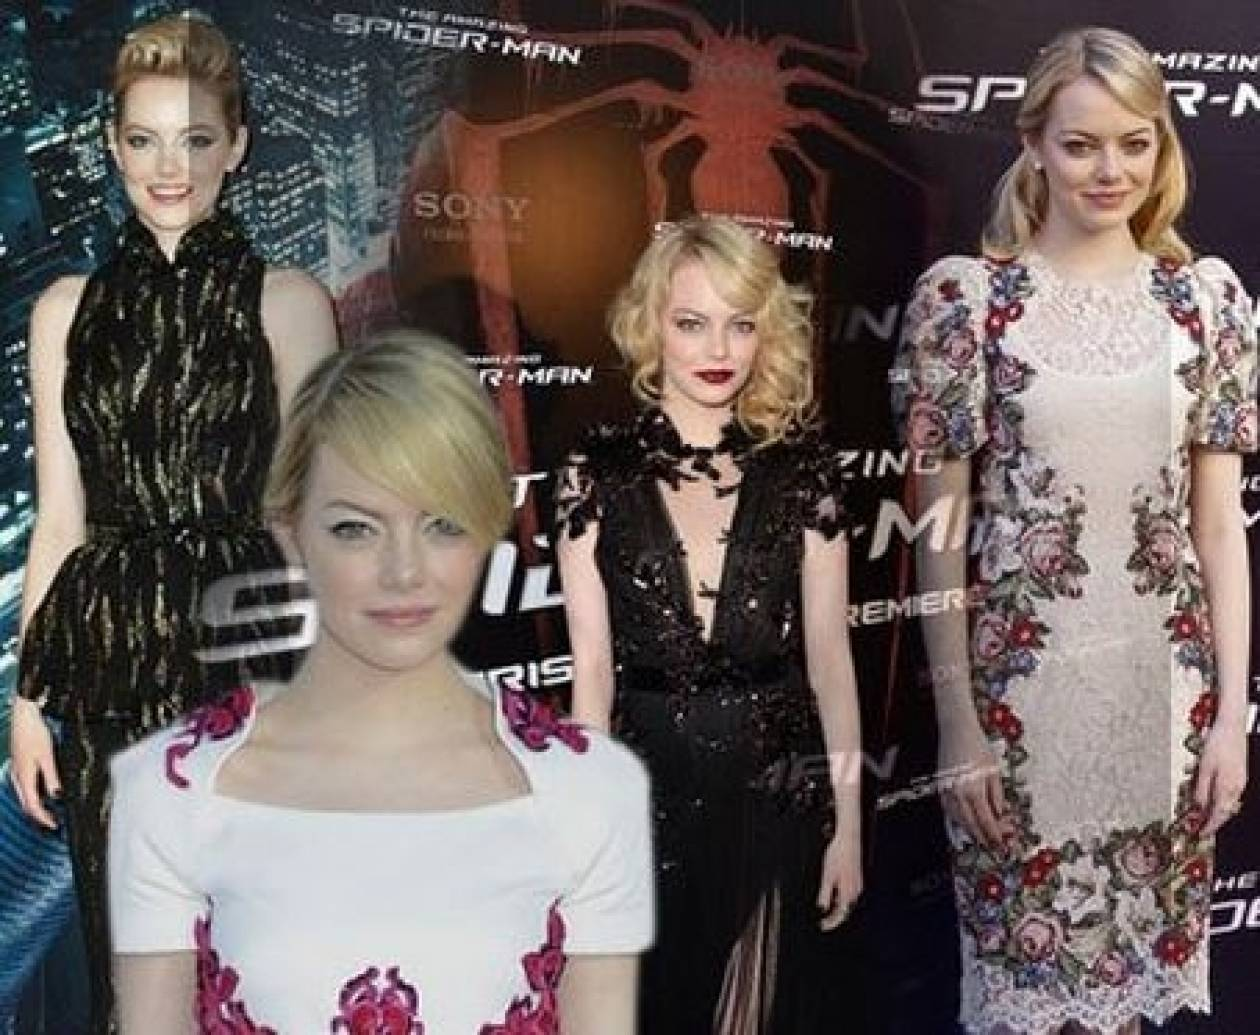 Emma Stone: η πιο καλοντυμένη σε promo tour της χρονιάς